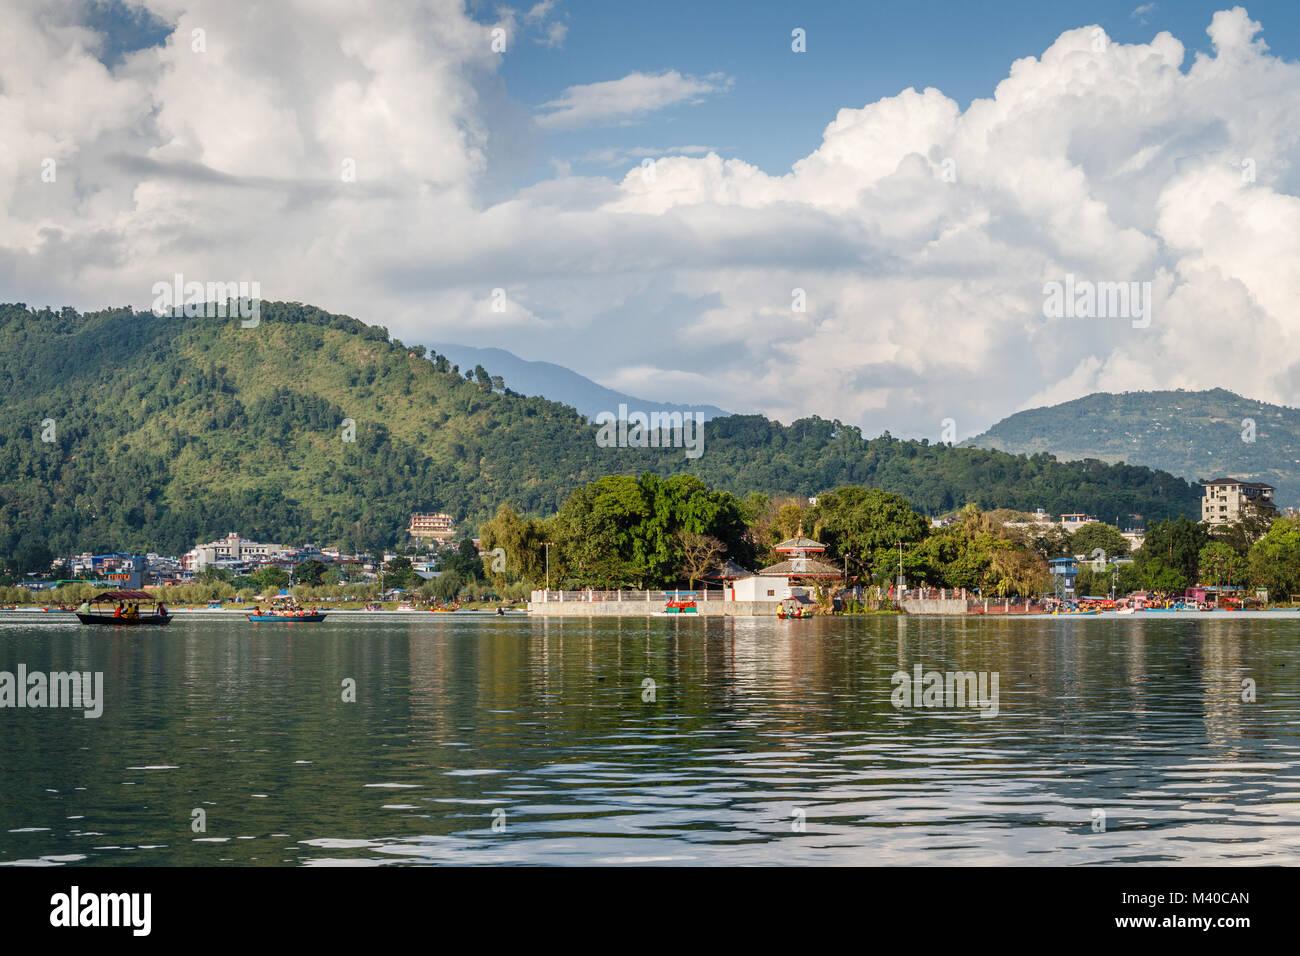 Views of Lake Side of Pokhara from Phewa Lake, Pokhara, Nepal - Stock Image